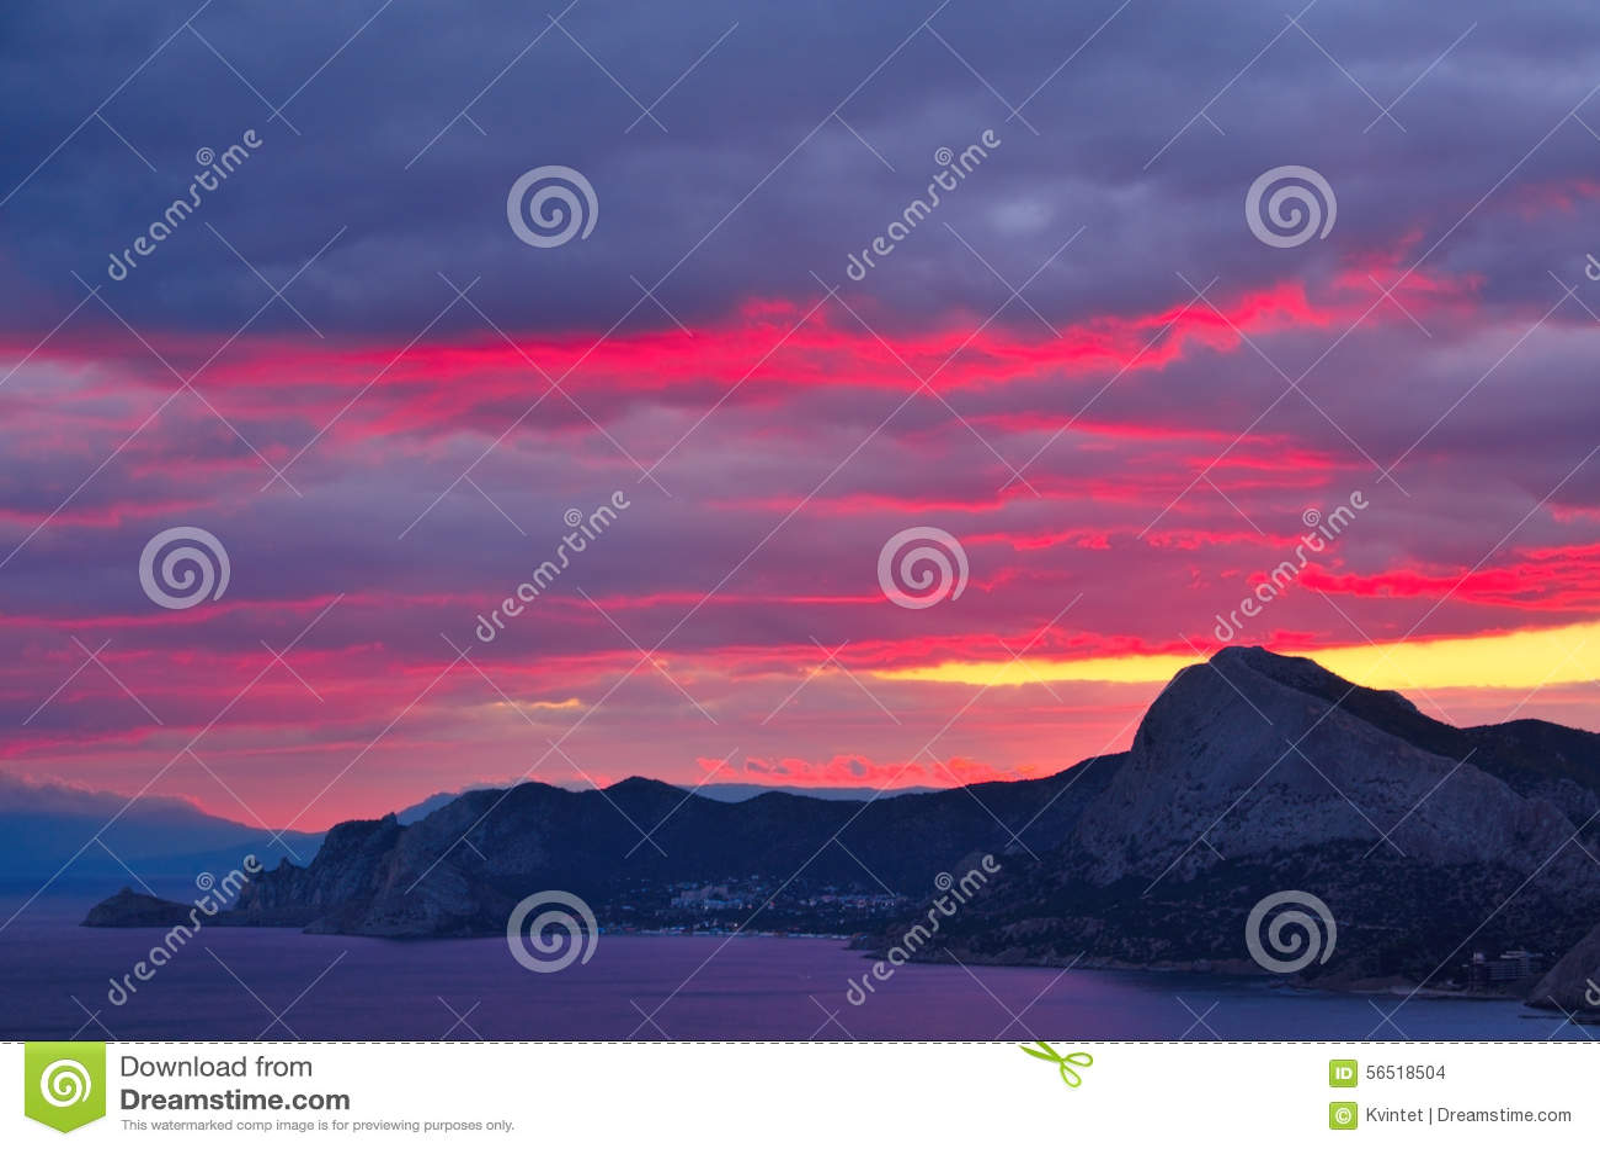 blue ocean clouds scenic - photo #31